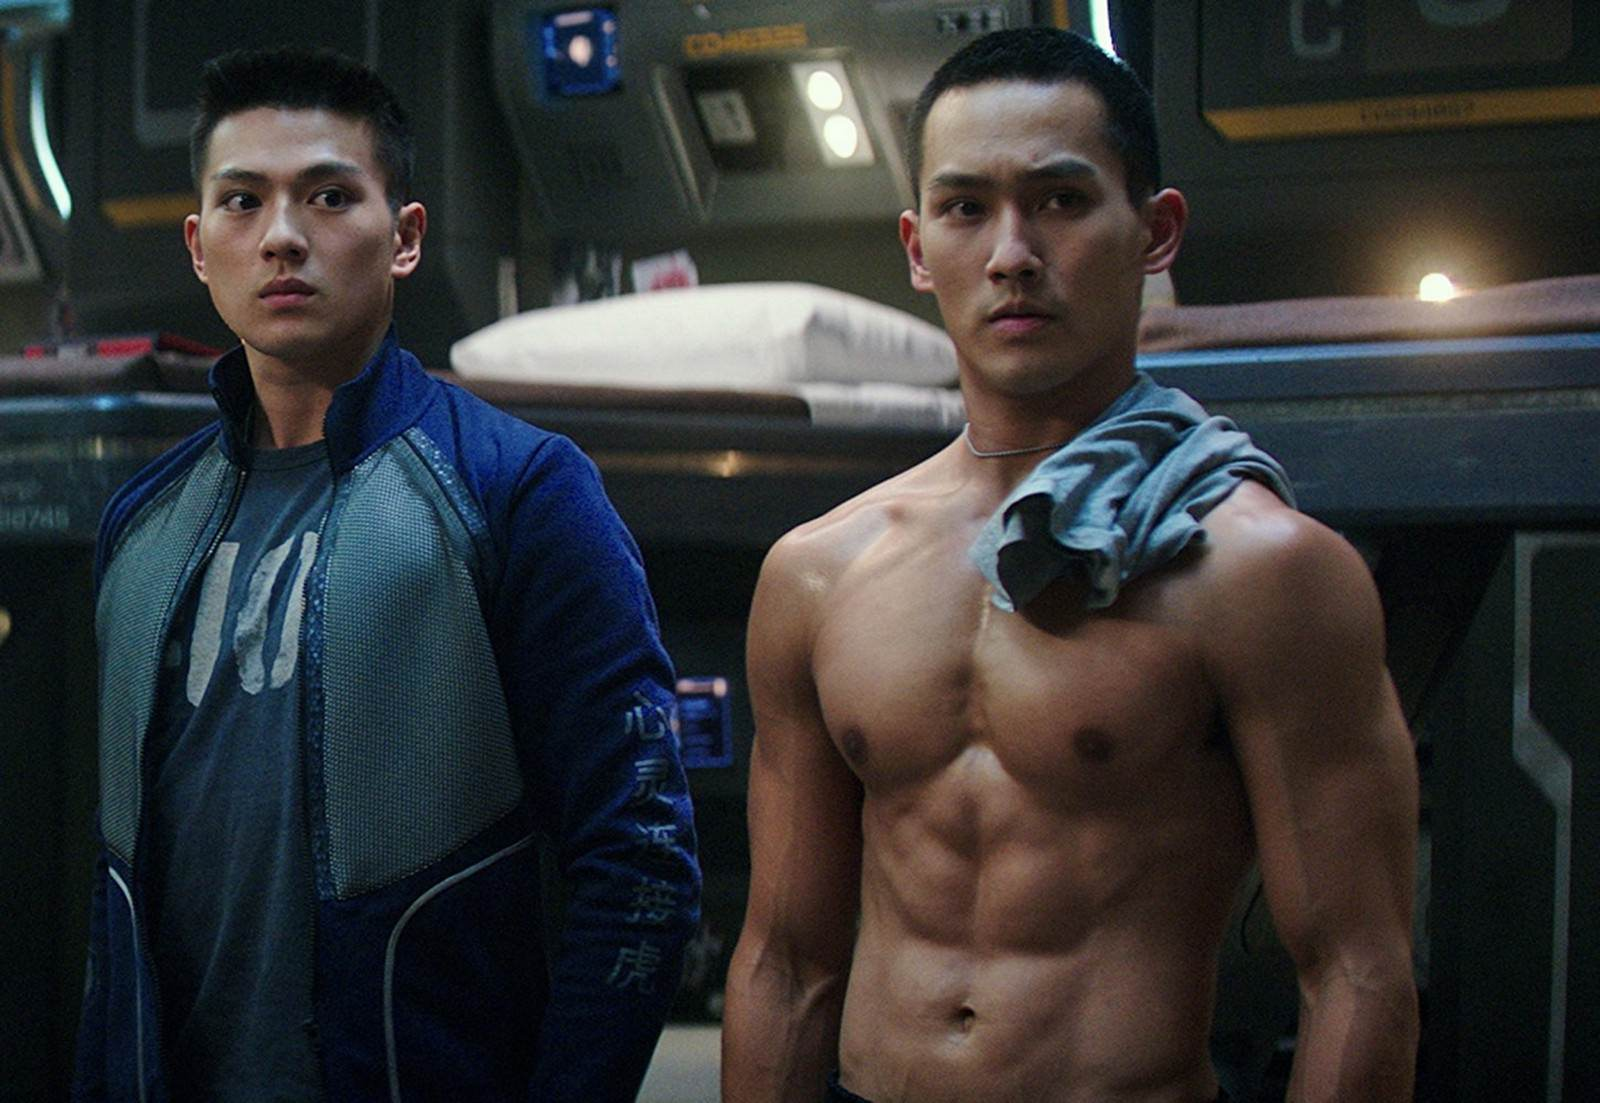 Movie, Pacific Rim: Uprising(美國) / 環太平洋2:起義時刻(台) / 环太平洋:雷霆再起(中) / 悍戰太平洋2:起義時空(港), 電影劇照